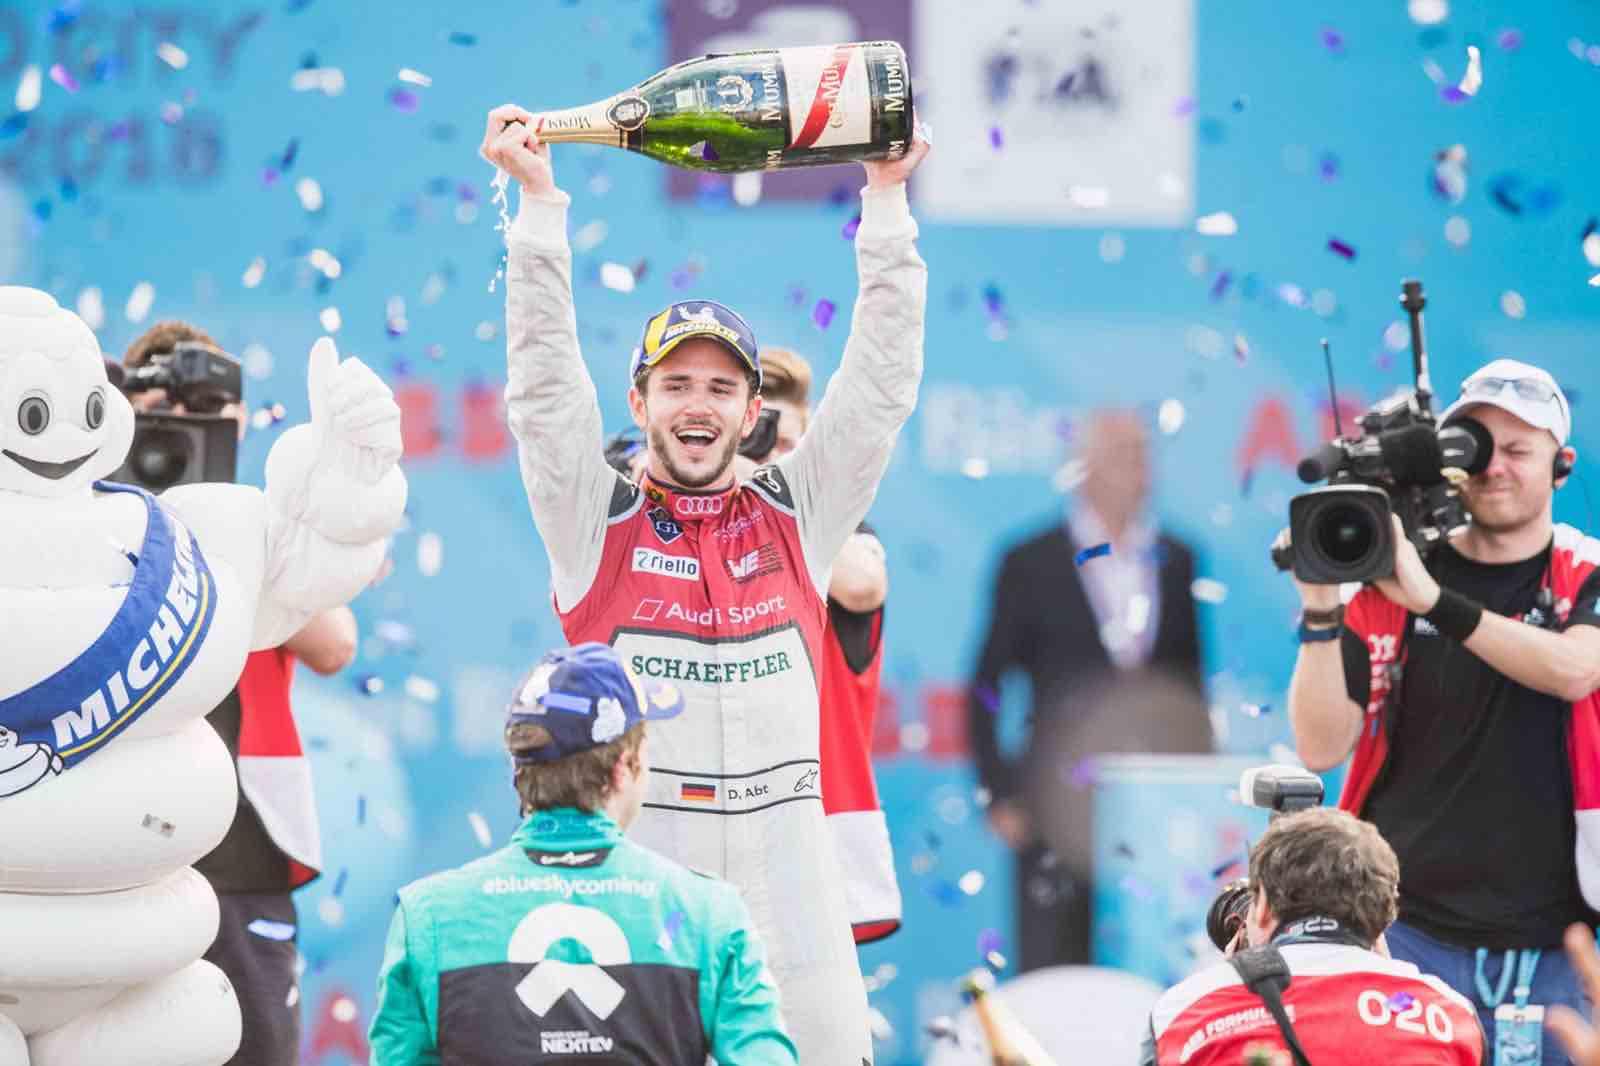 La Maison de champagne Mumm celebra a Daniel Abt, ganador en la Fórmula E en la Ciudad de México